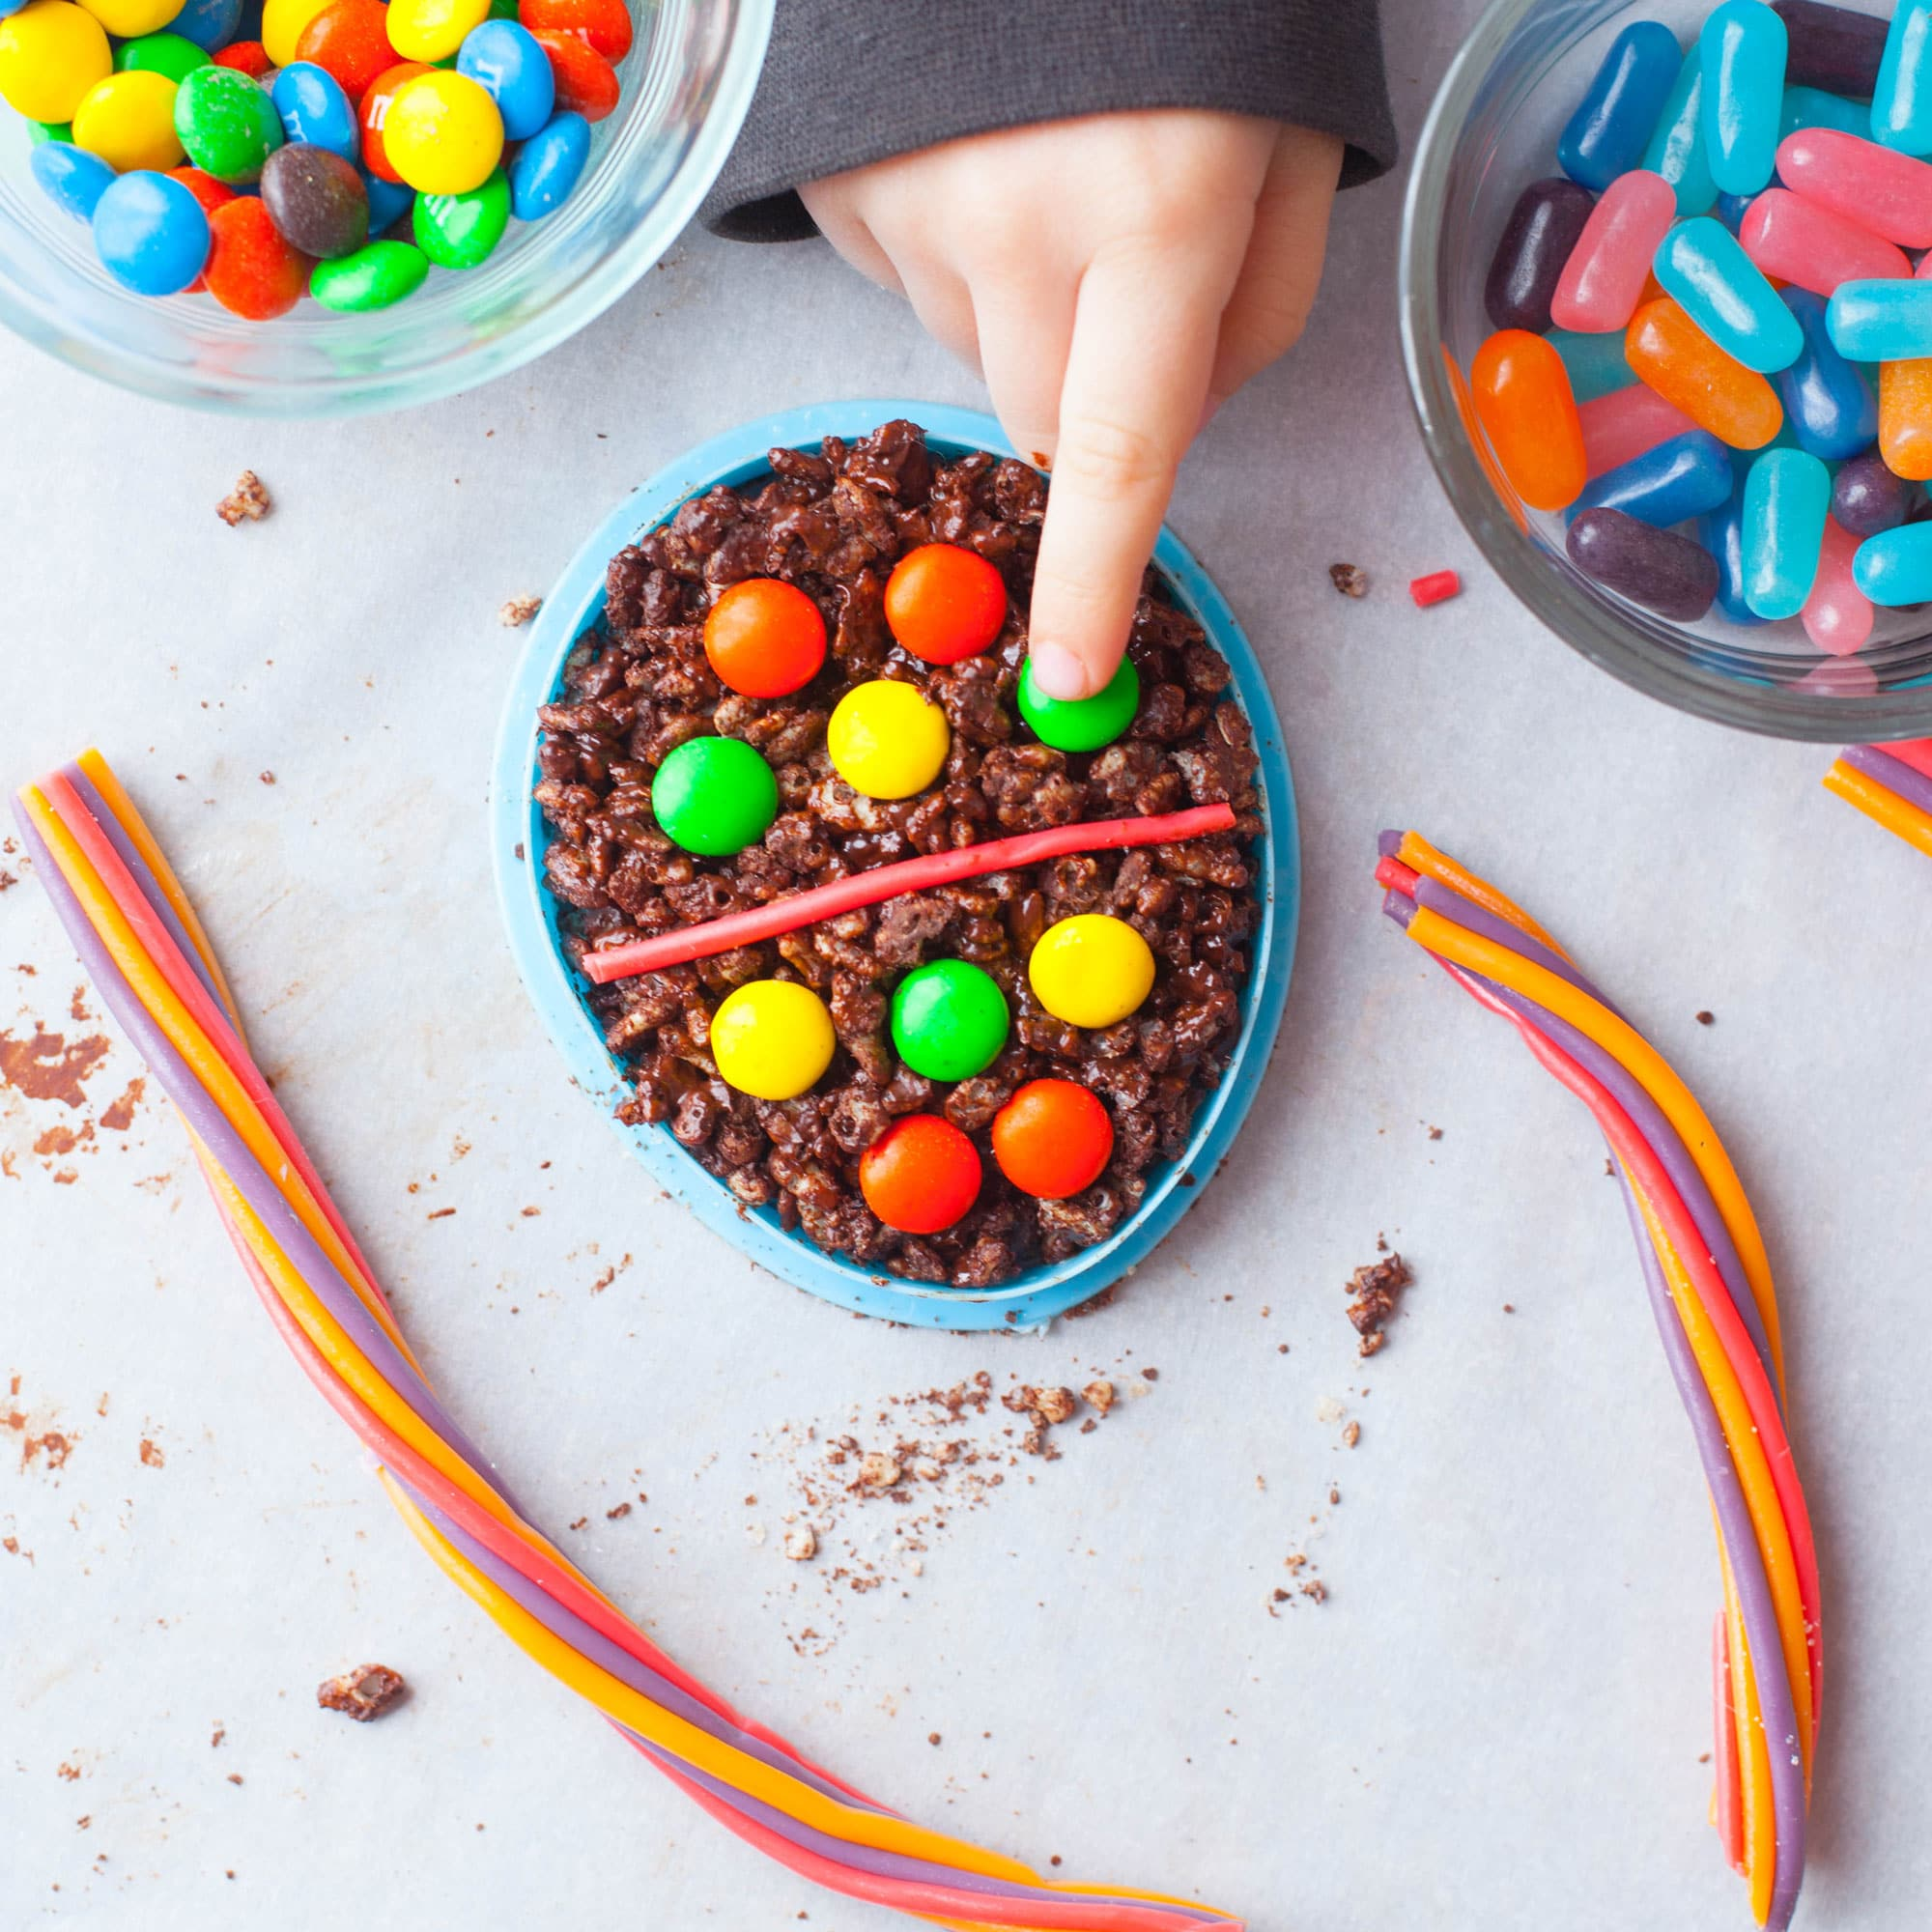 Child decorating chocolate Easter Rice Krispie Treat